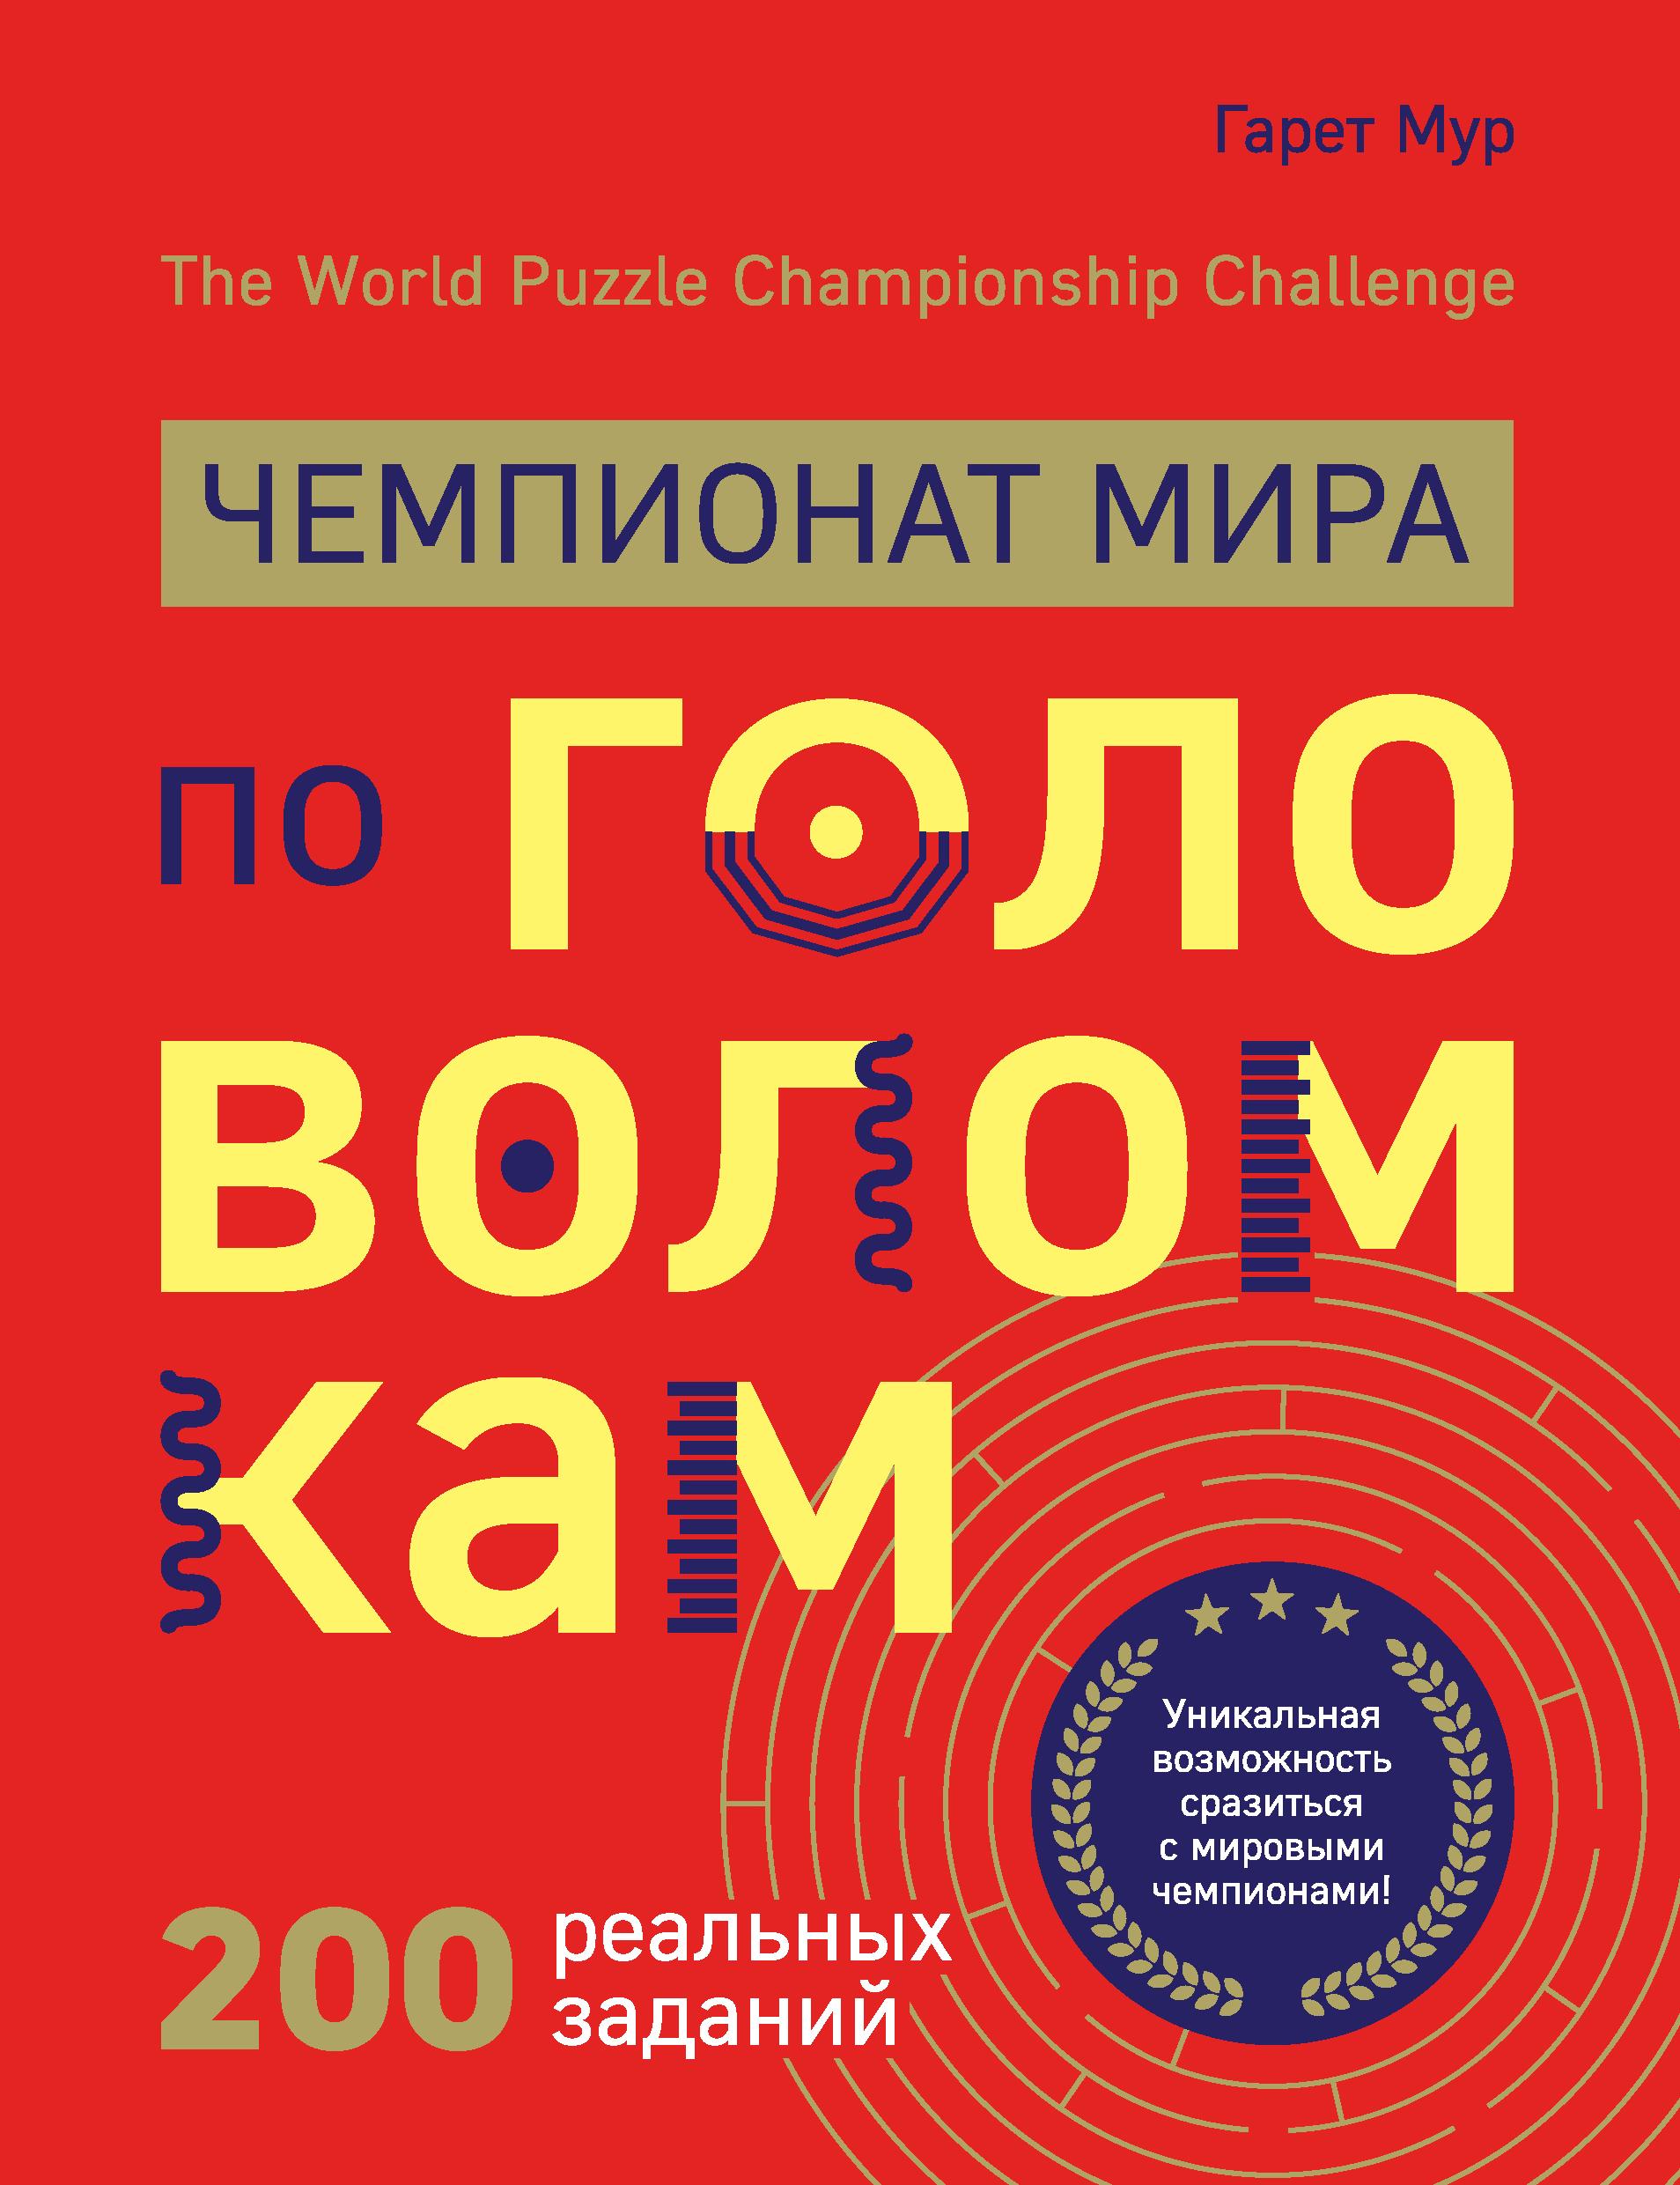 Гарет Мур Чемпионат мира по головоломкам. The World Puzzle Championship Challenge. 200 реальных заданий